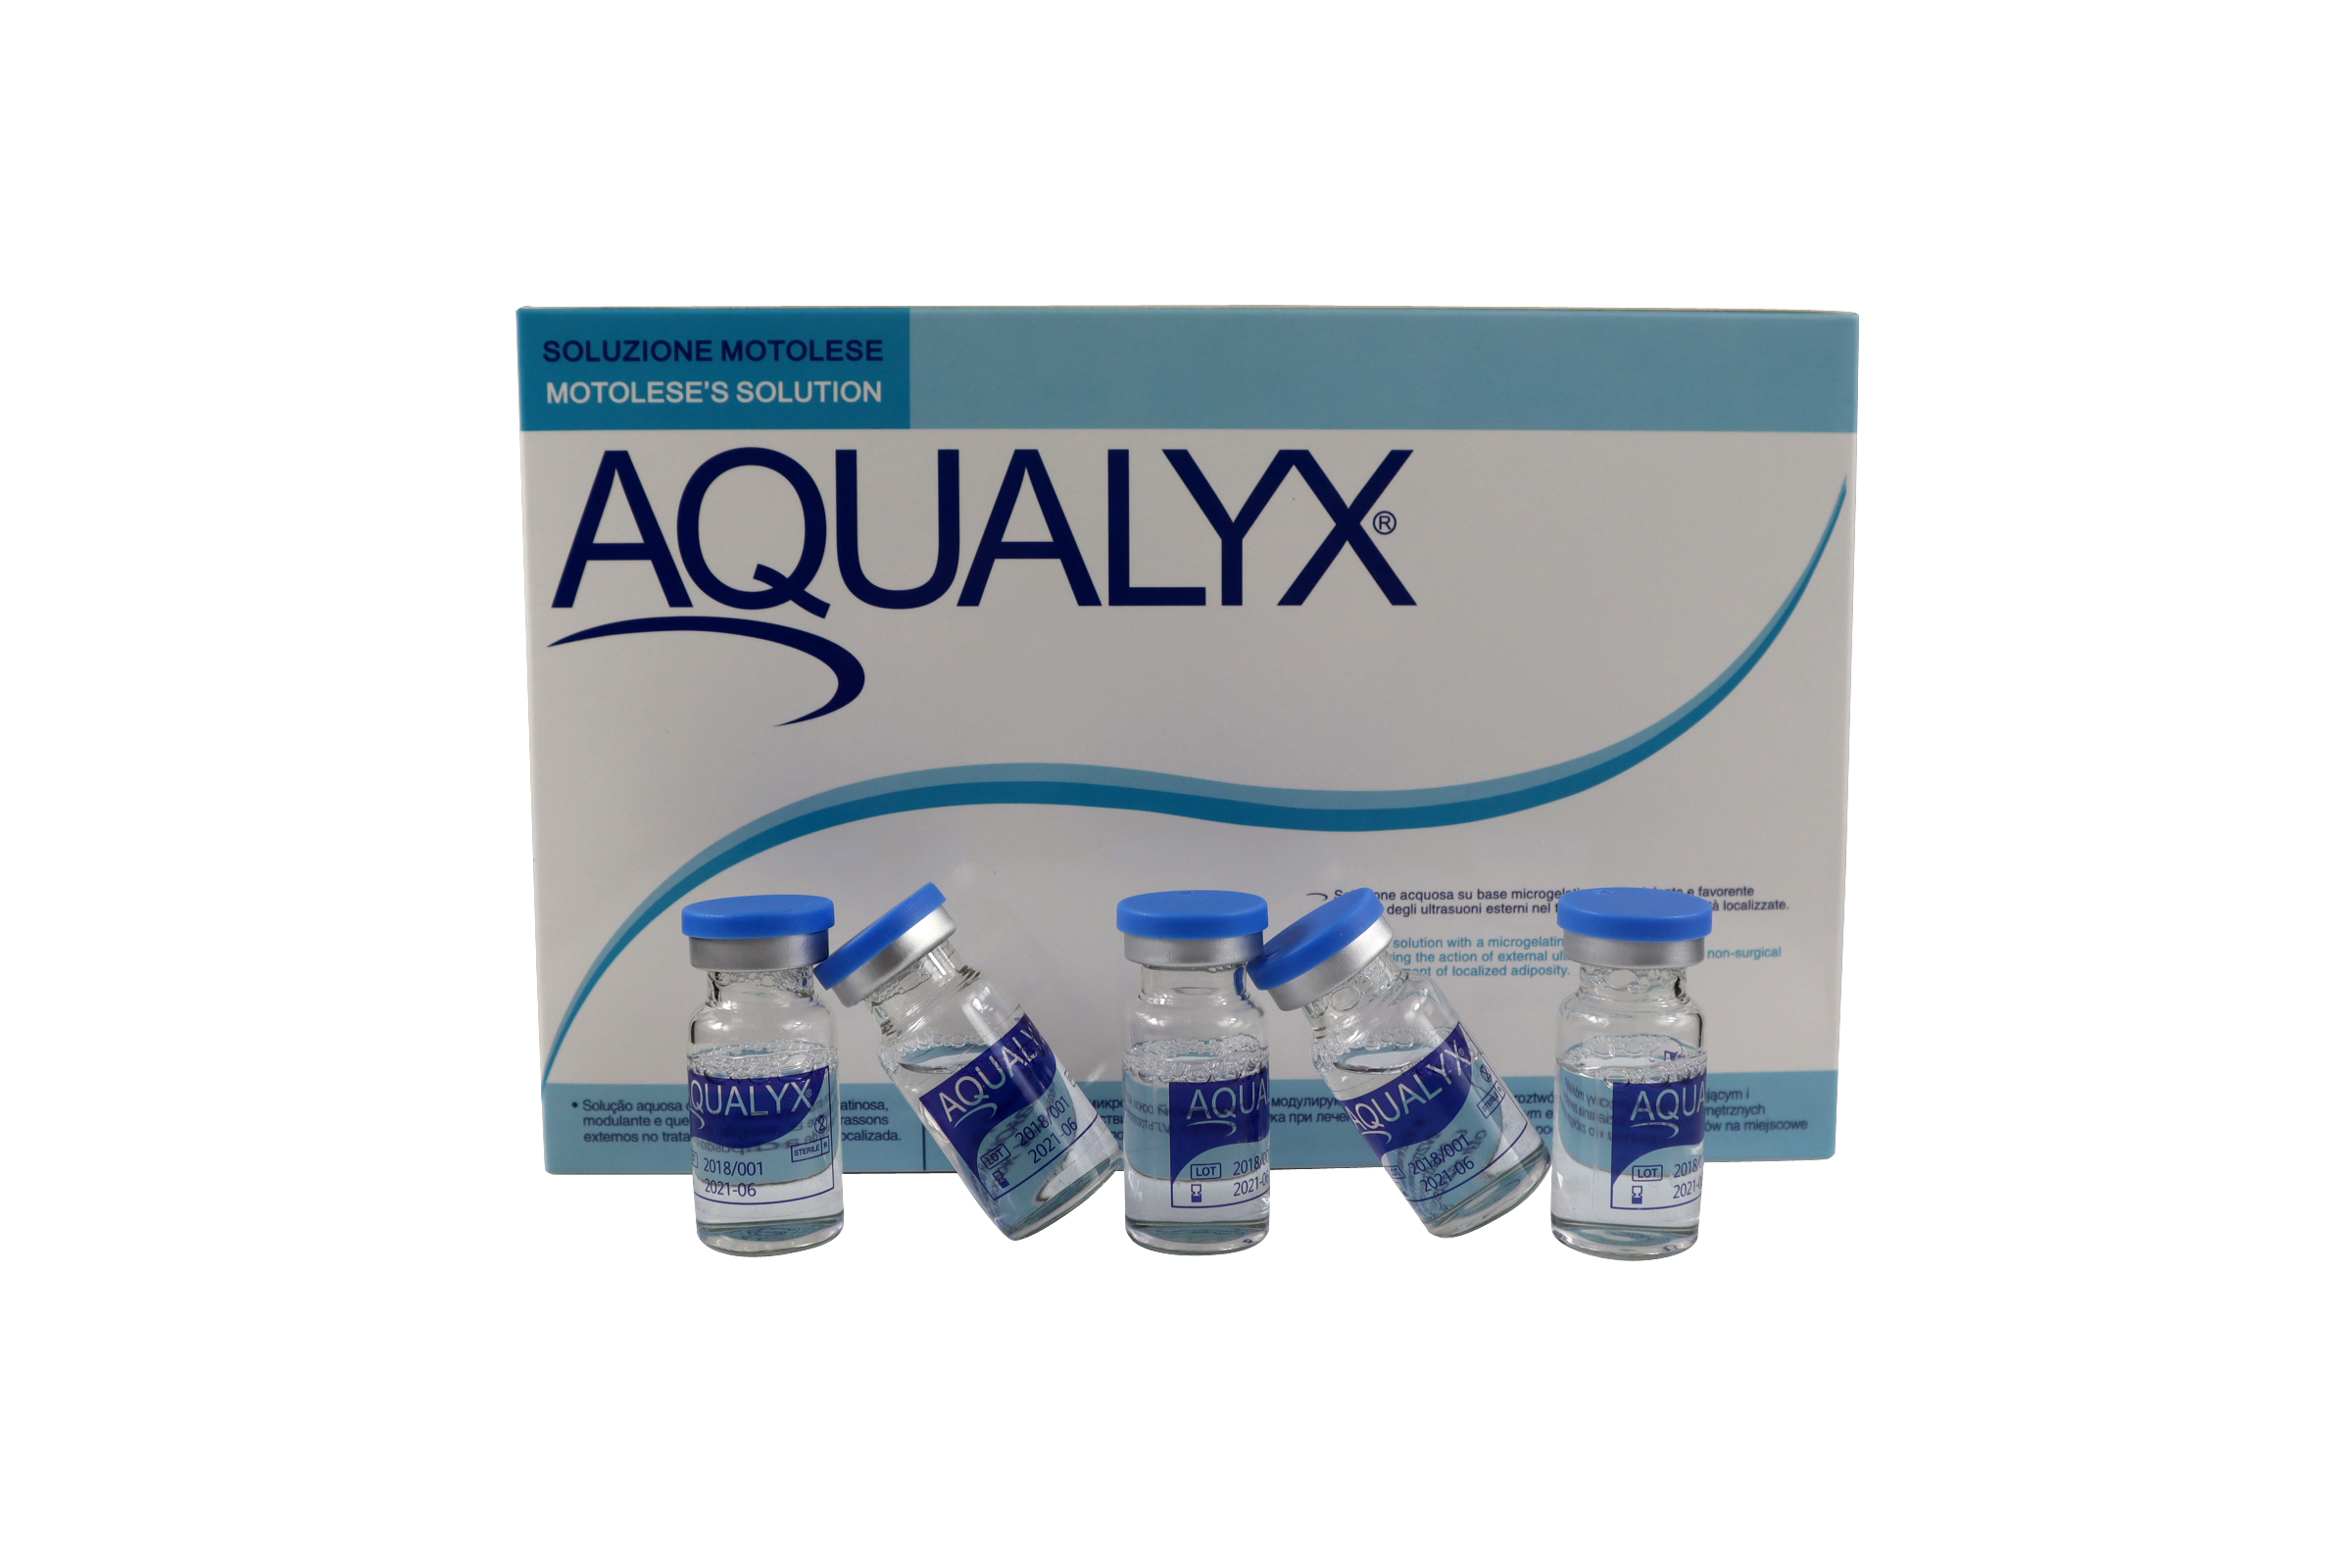 aqualyx slimming